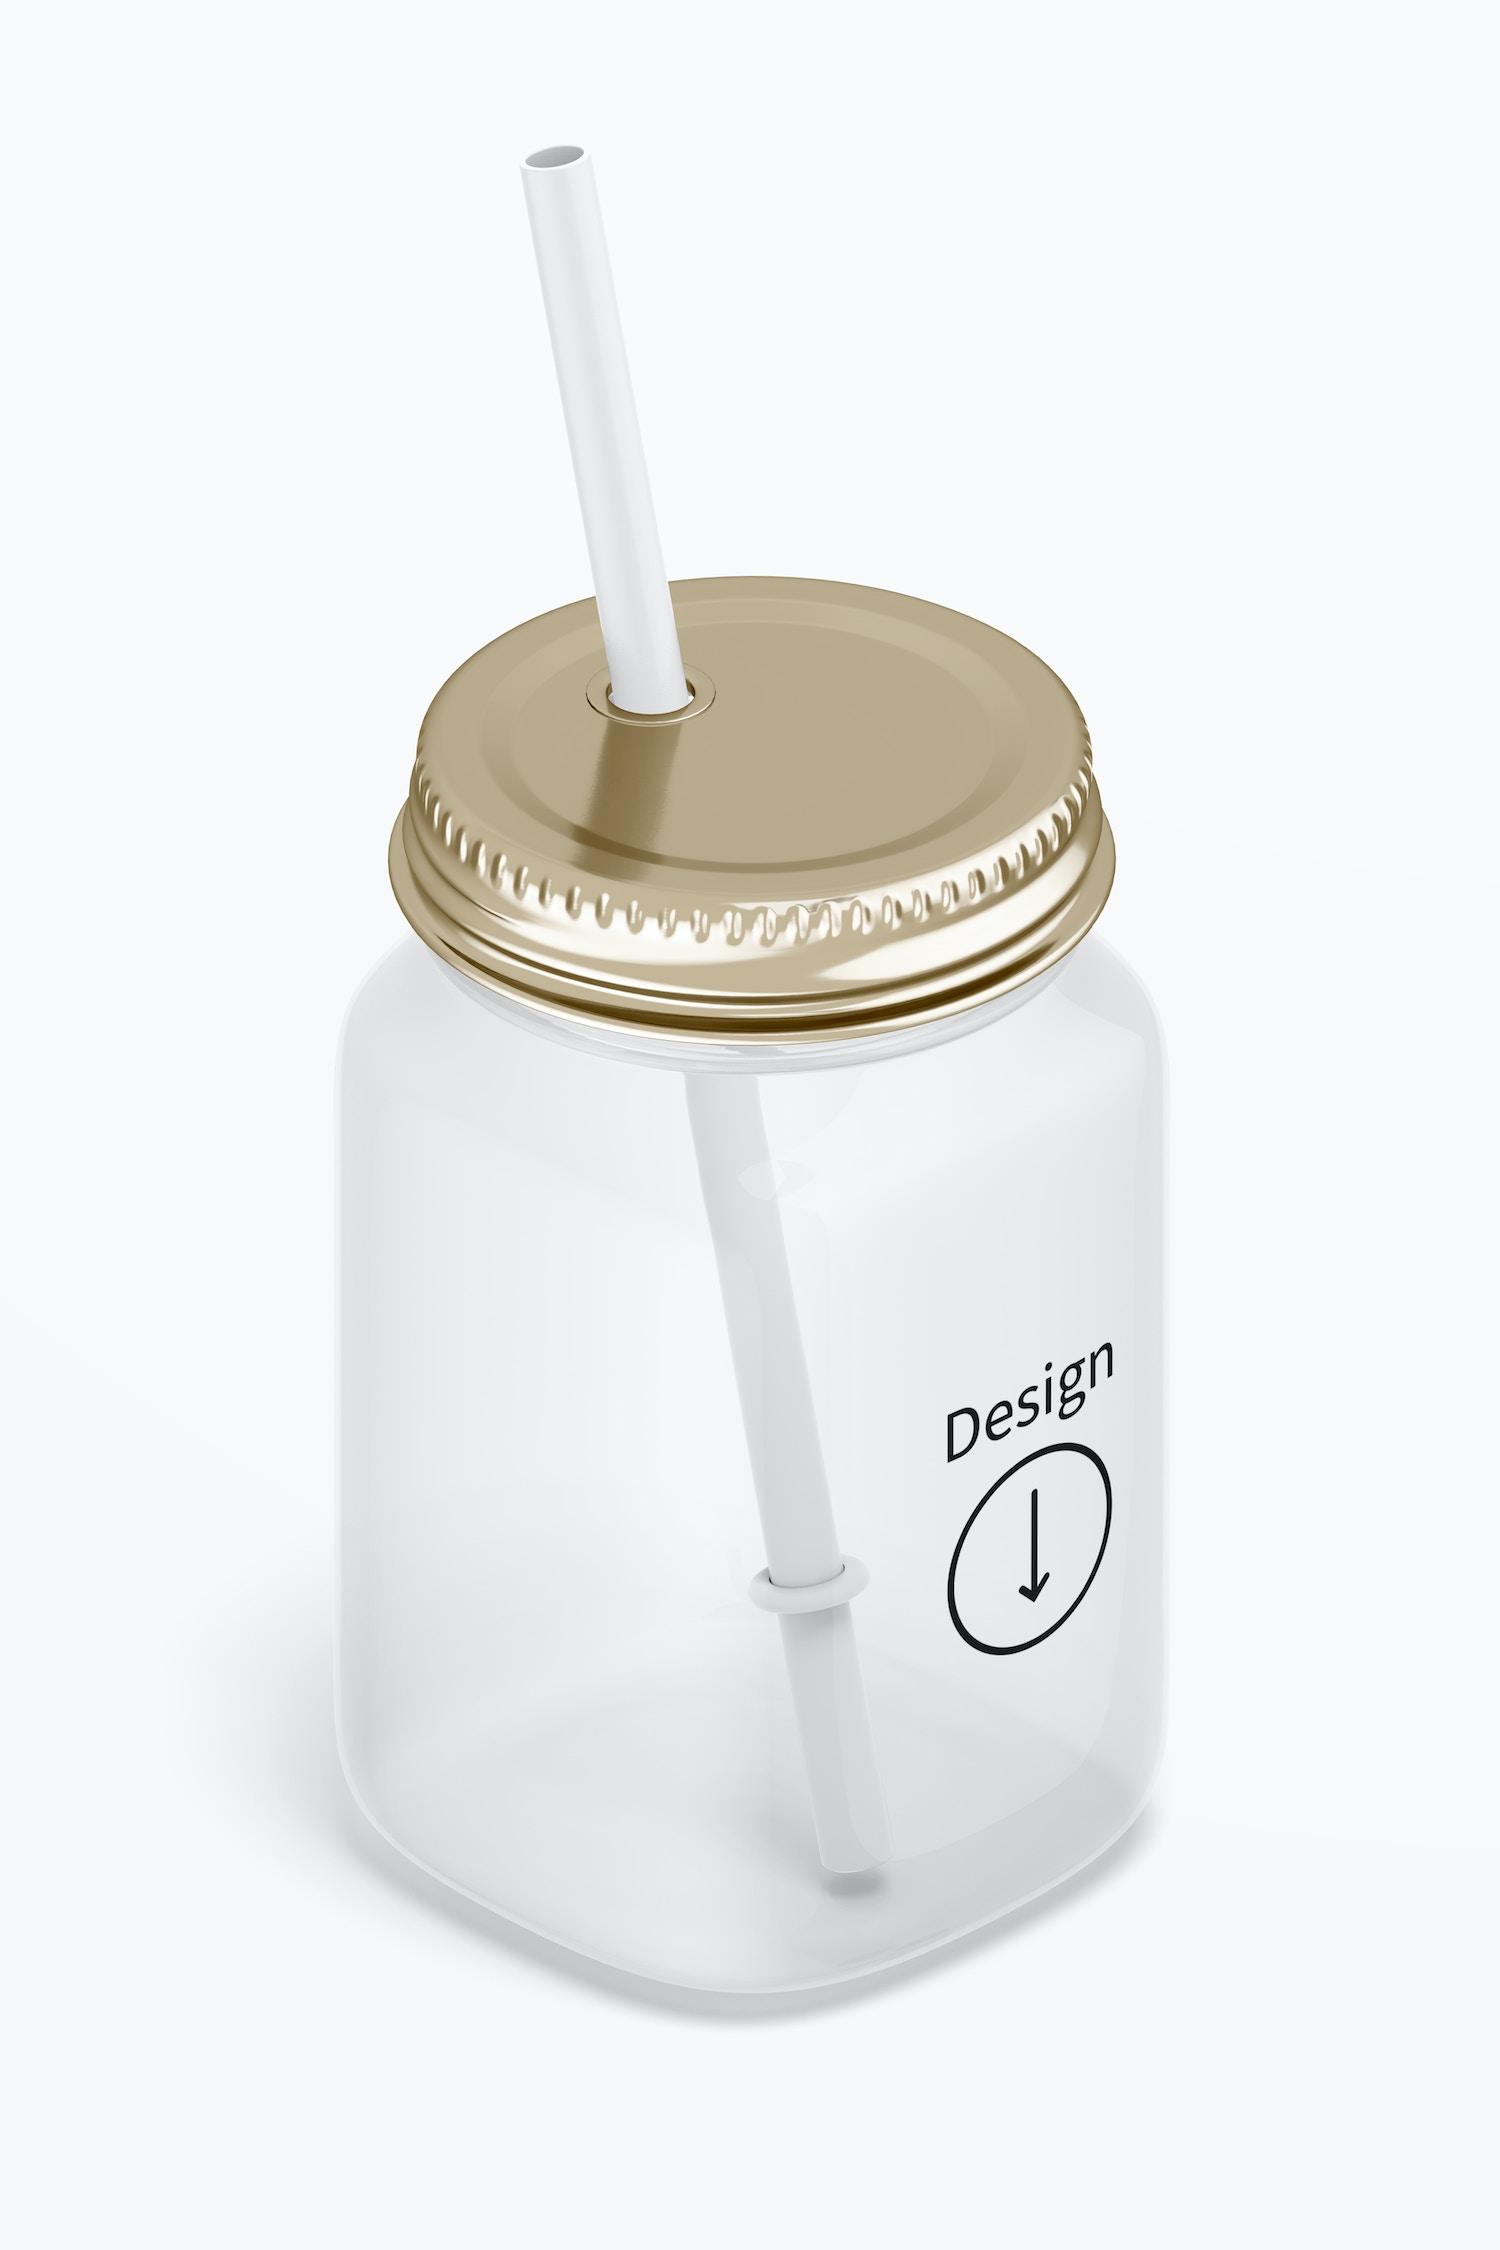 16 oz Mason Jar with Straw Mockup, Isometric Left View